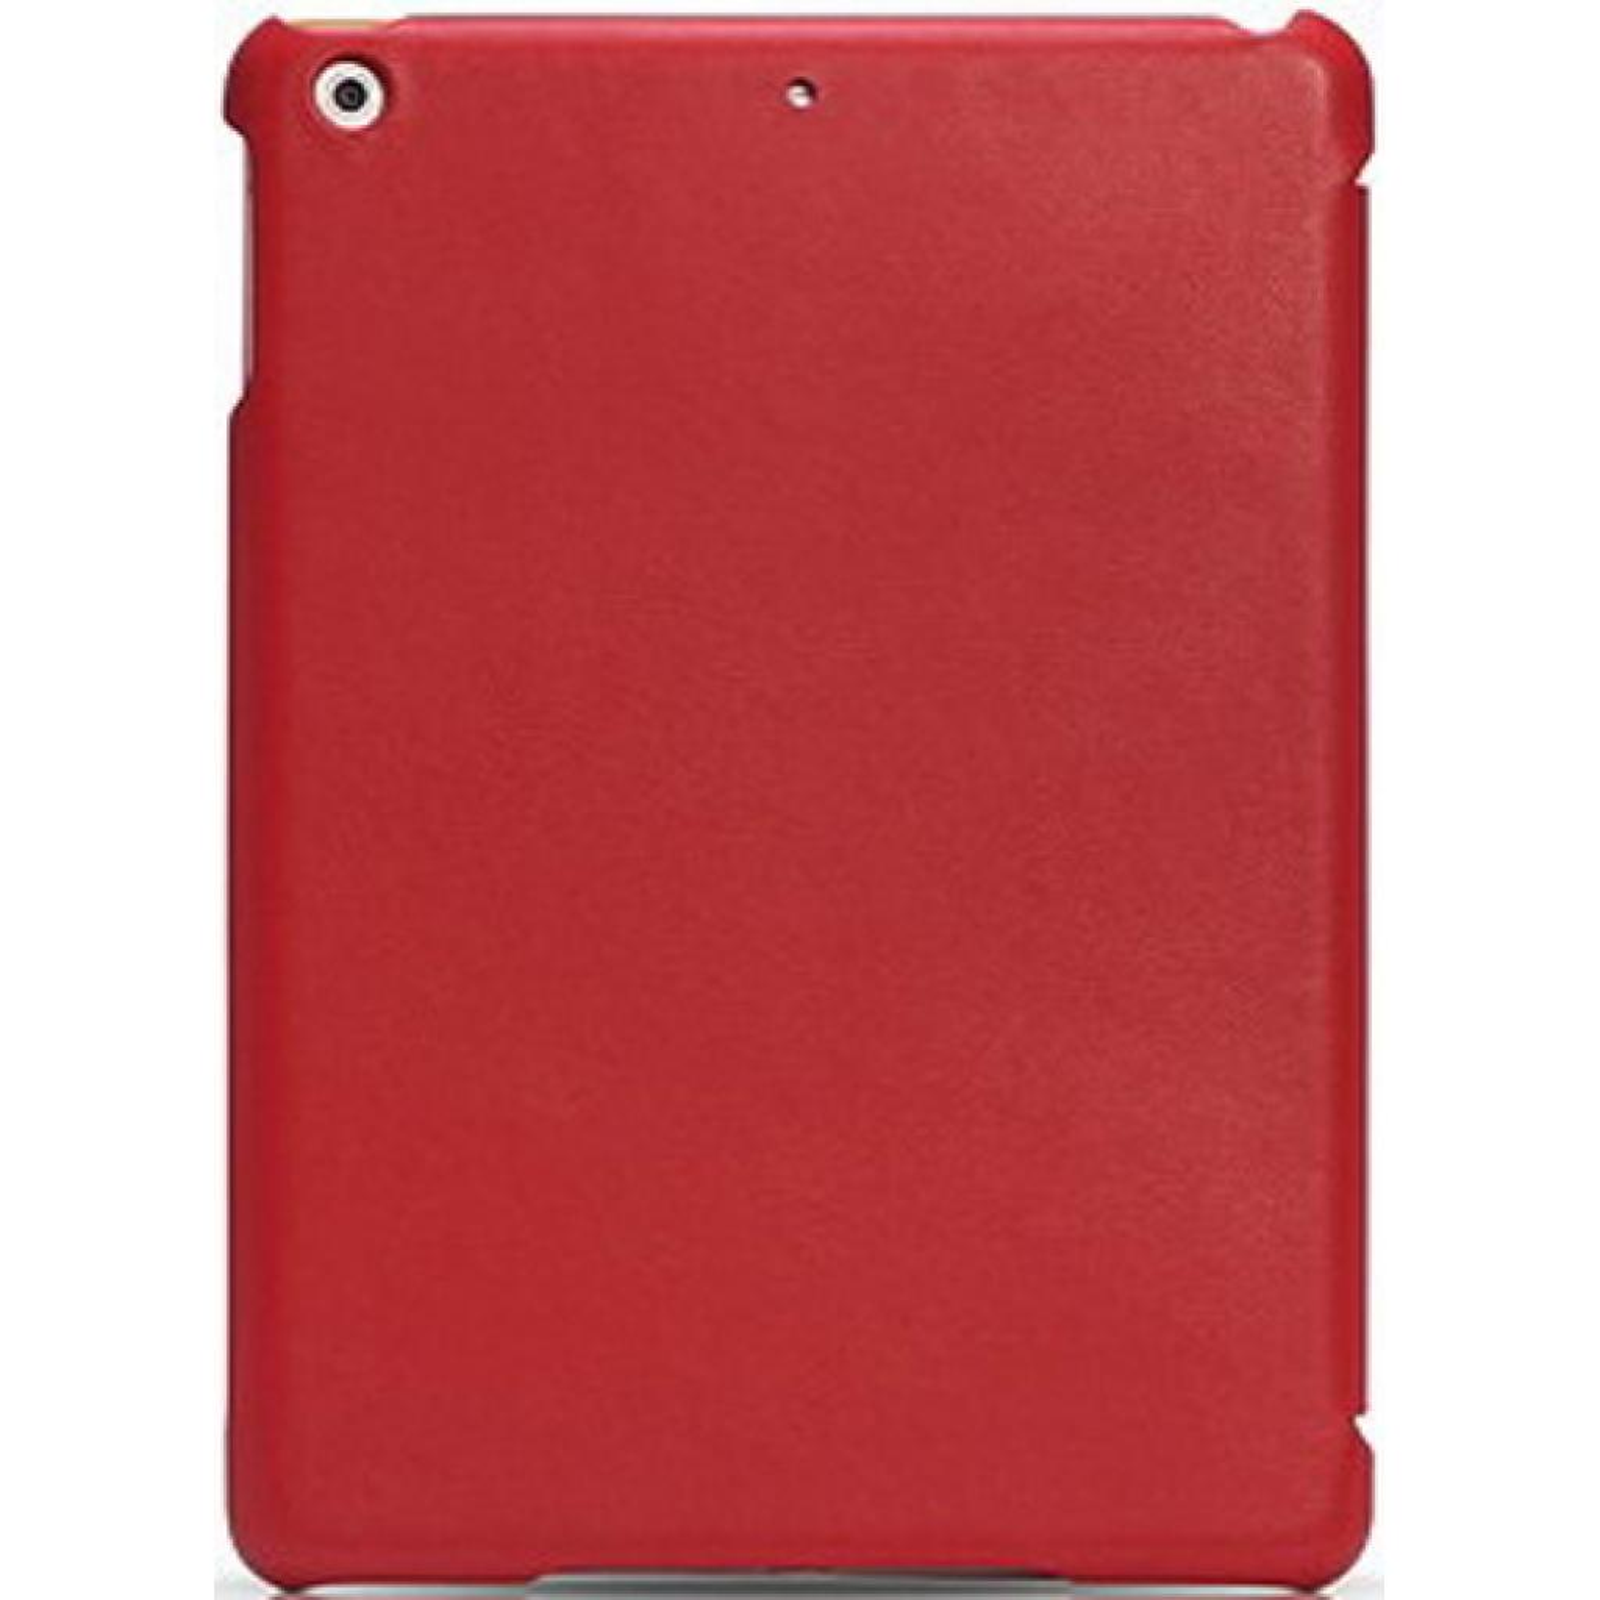 Чехол для планшета i-Carer iPad Air Ultra thin genuine leather series red (RID501red) изображение 2